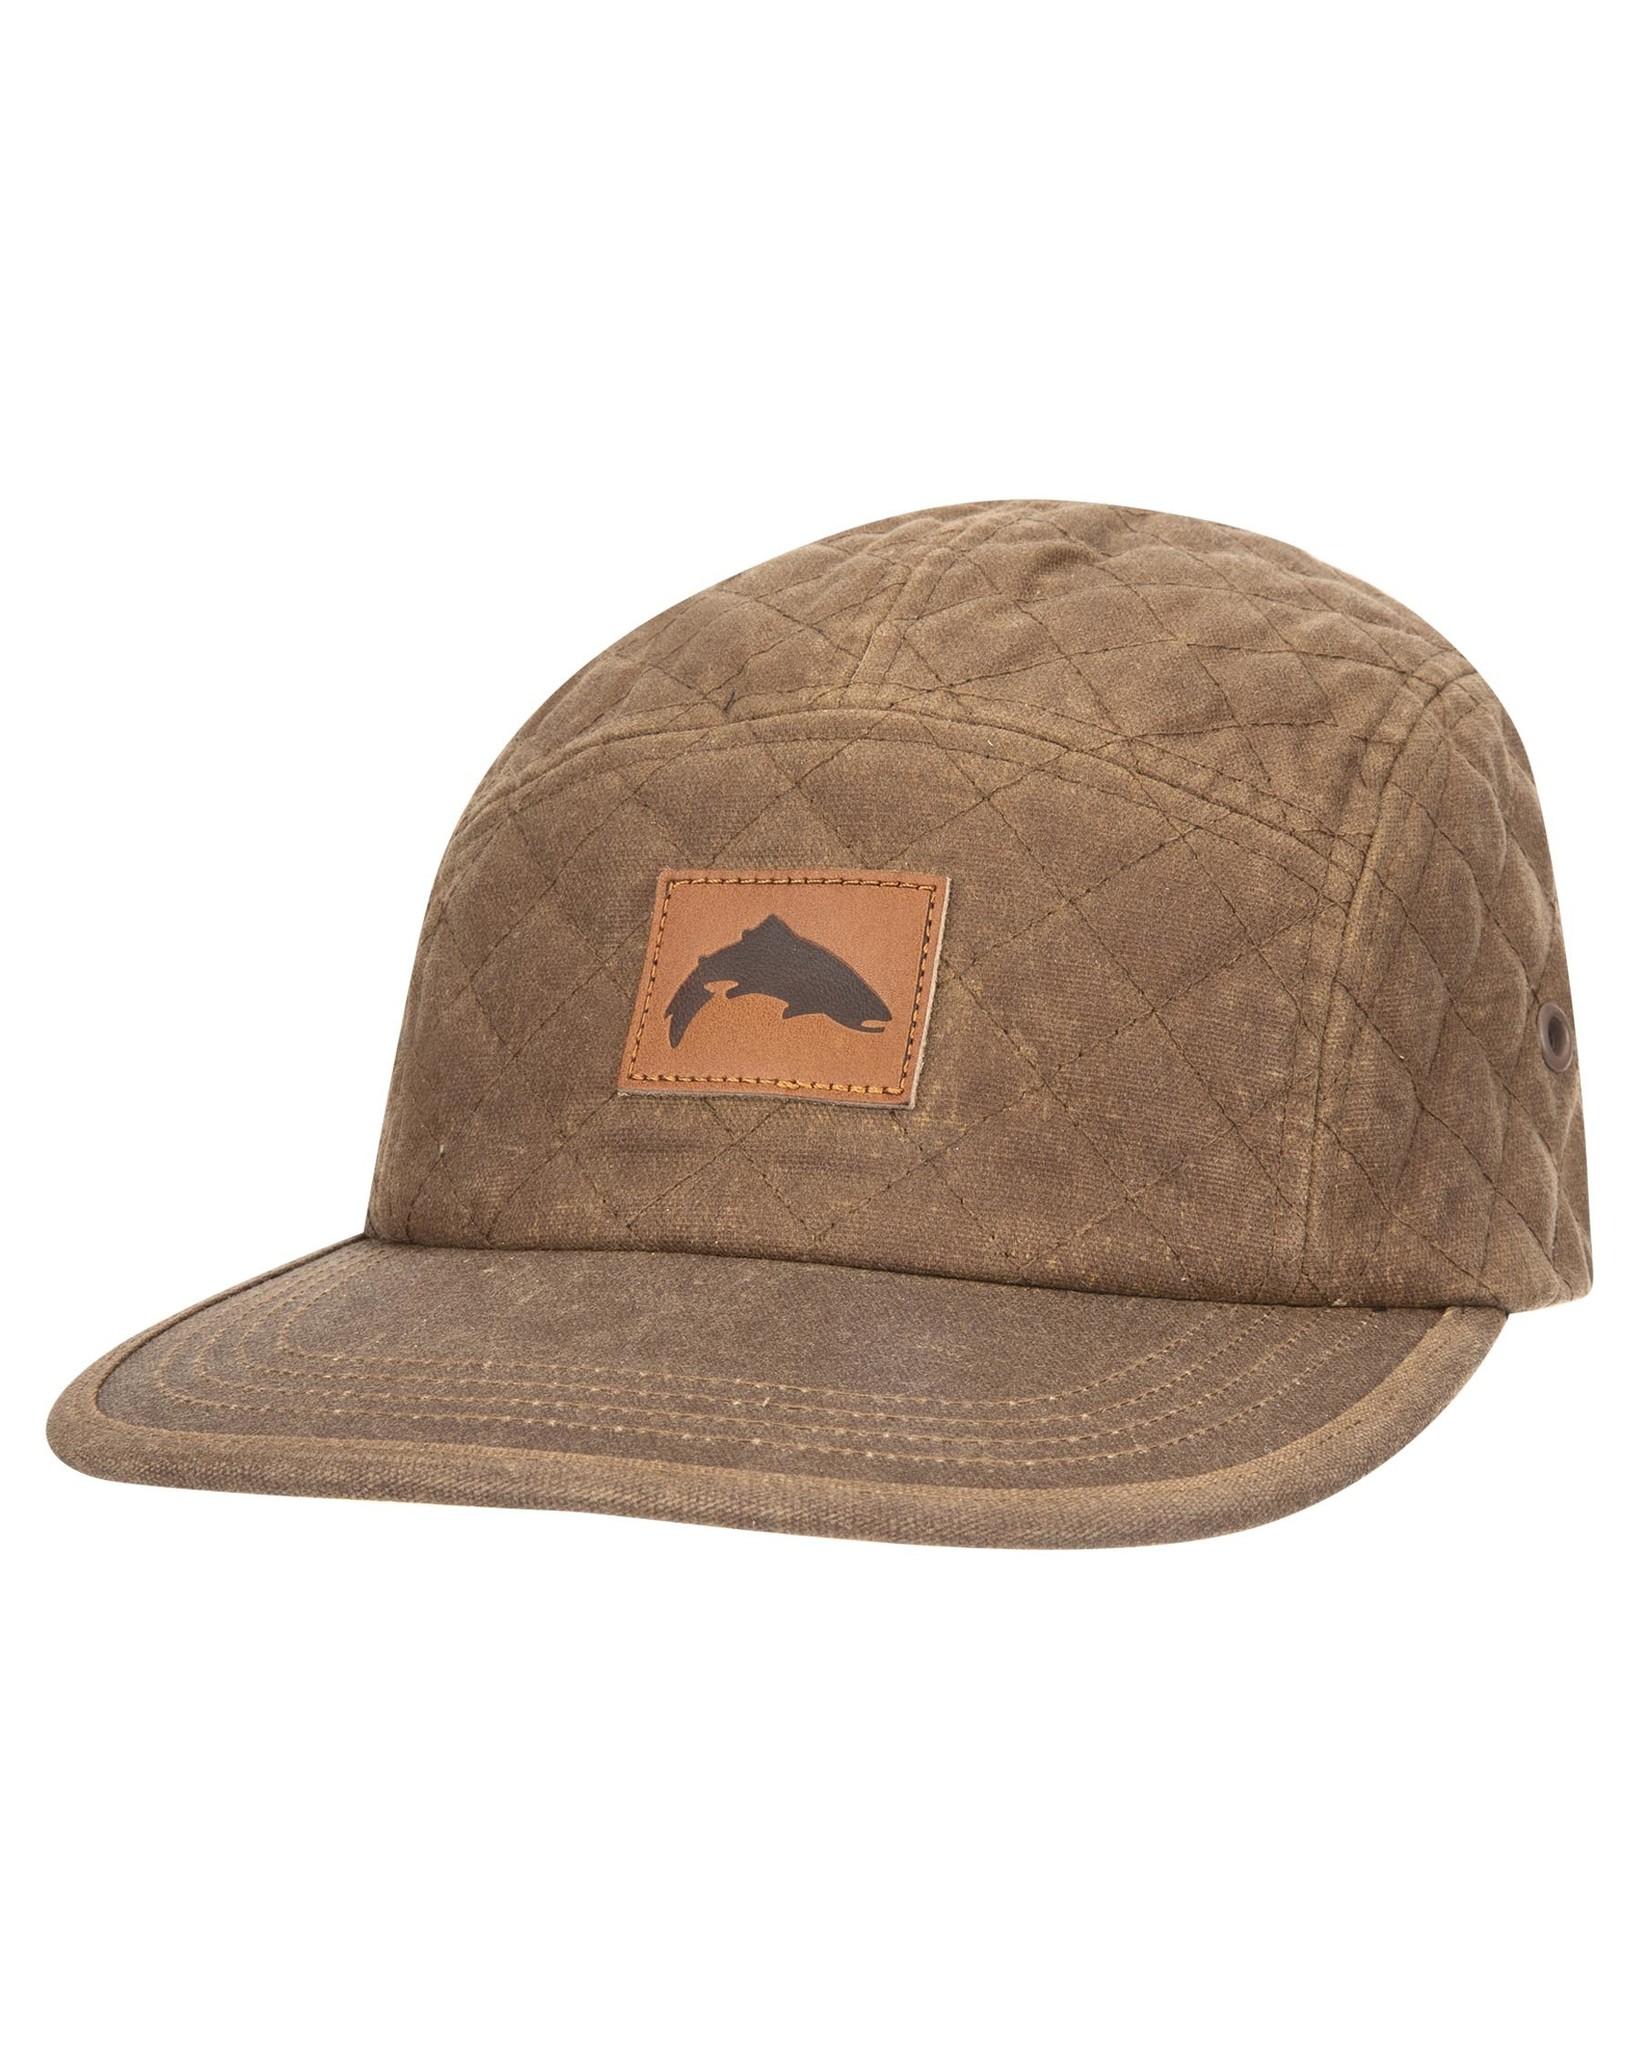 SIMMS DOCKWEAR INSULATED CAP Dark Bronze One Size